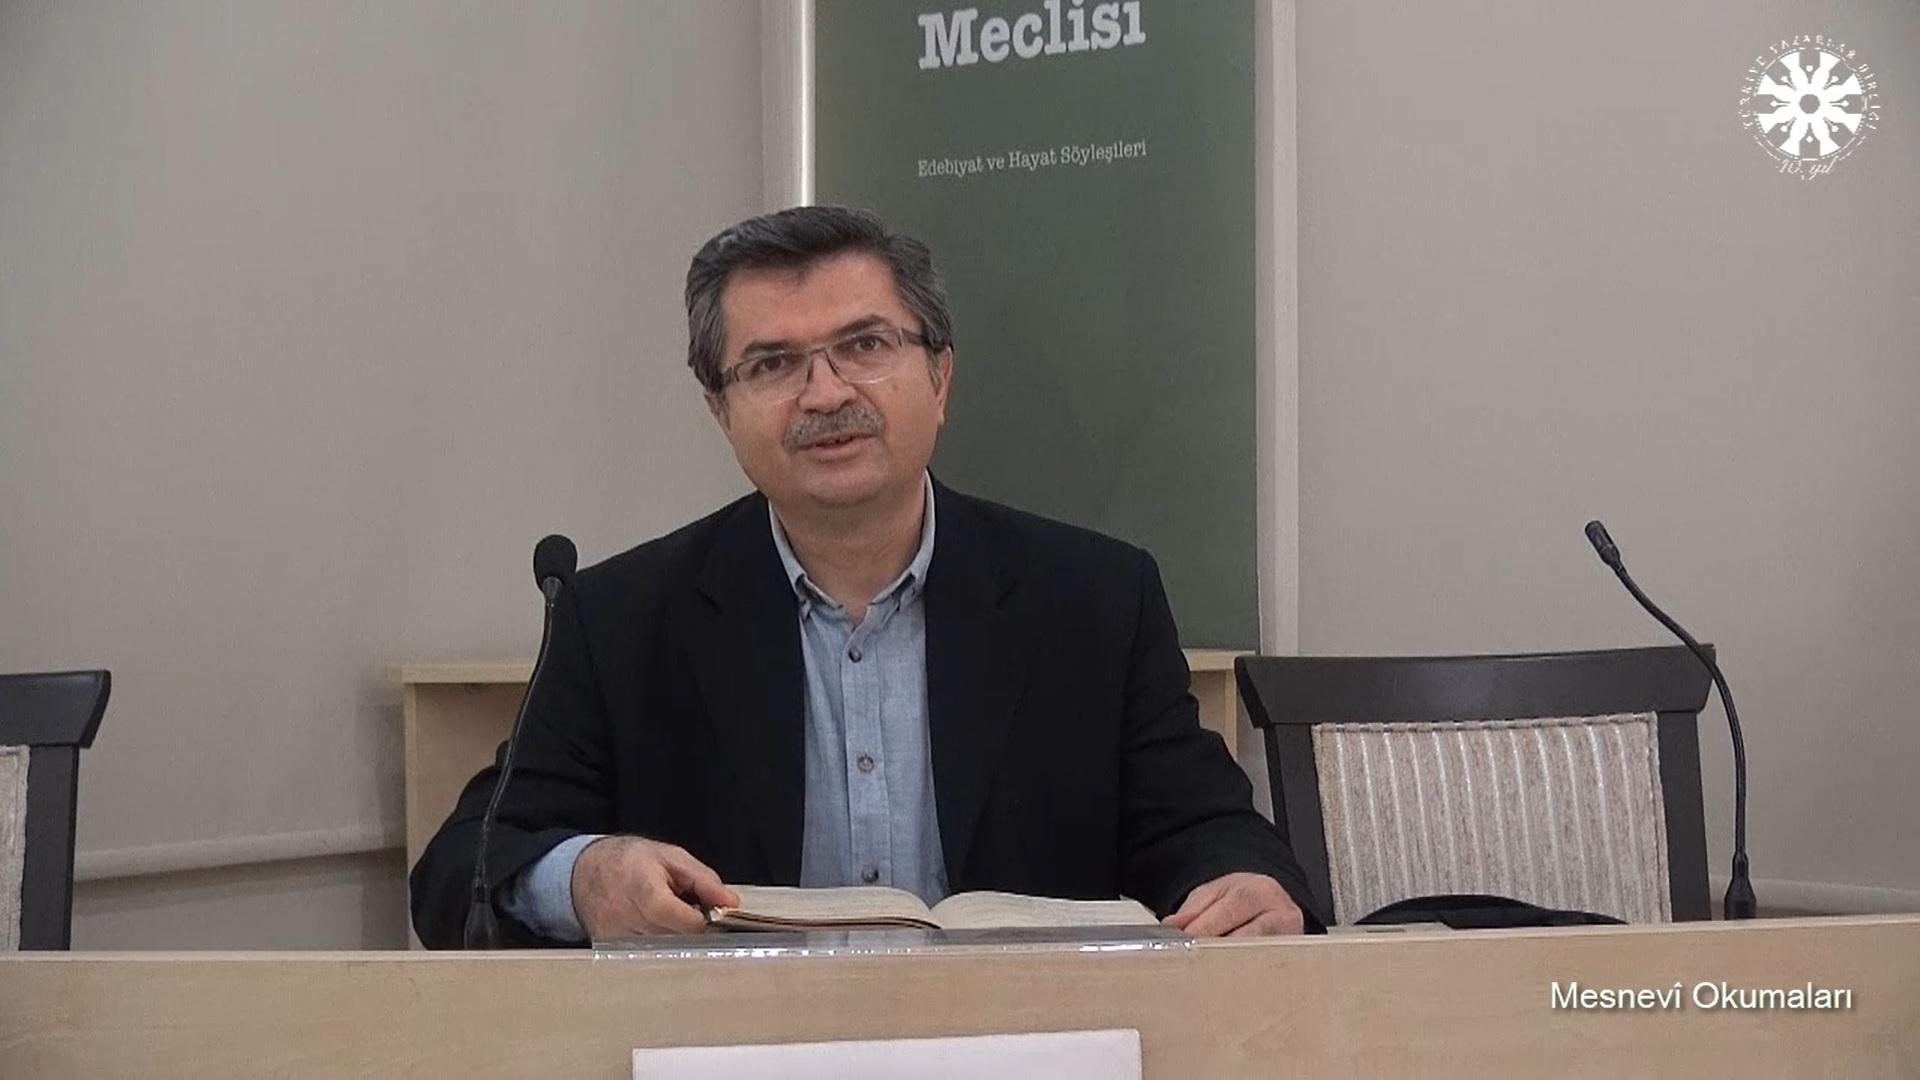 Mesnevî Okumaları -63- Dr. Fahrettin Coşguner